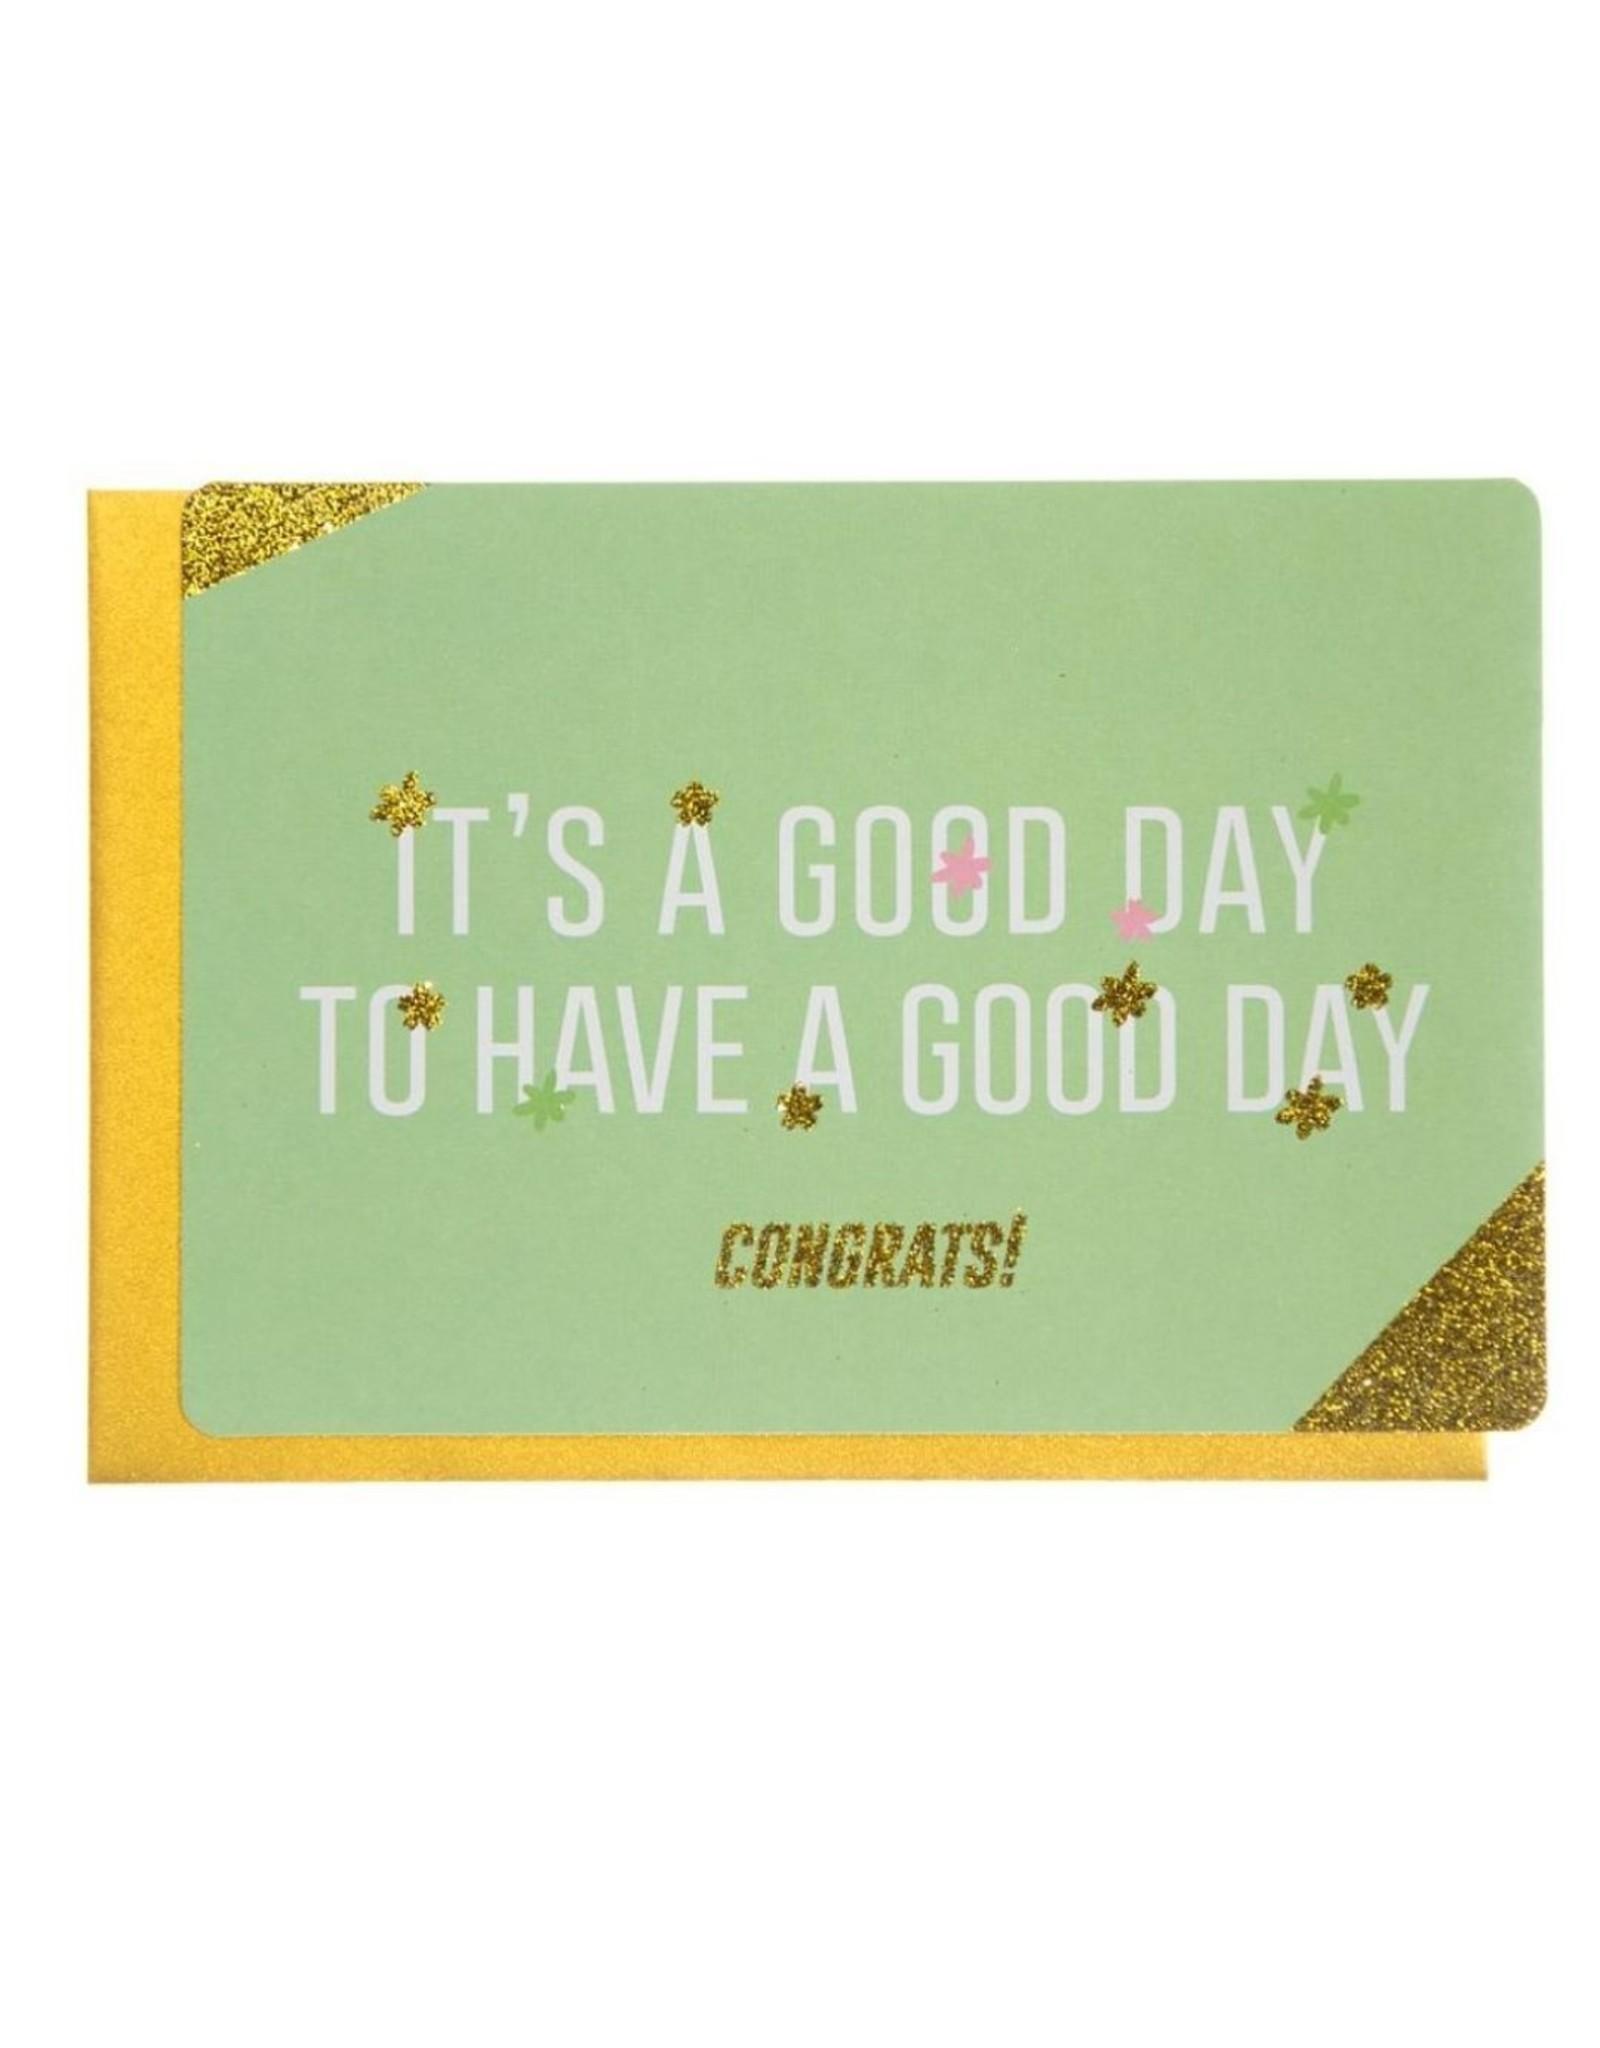 Enfant Terrible Wenskaart - It's a Good Day